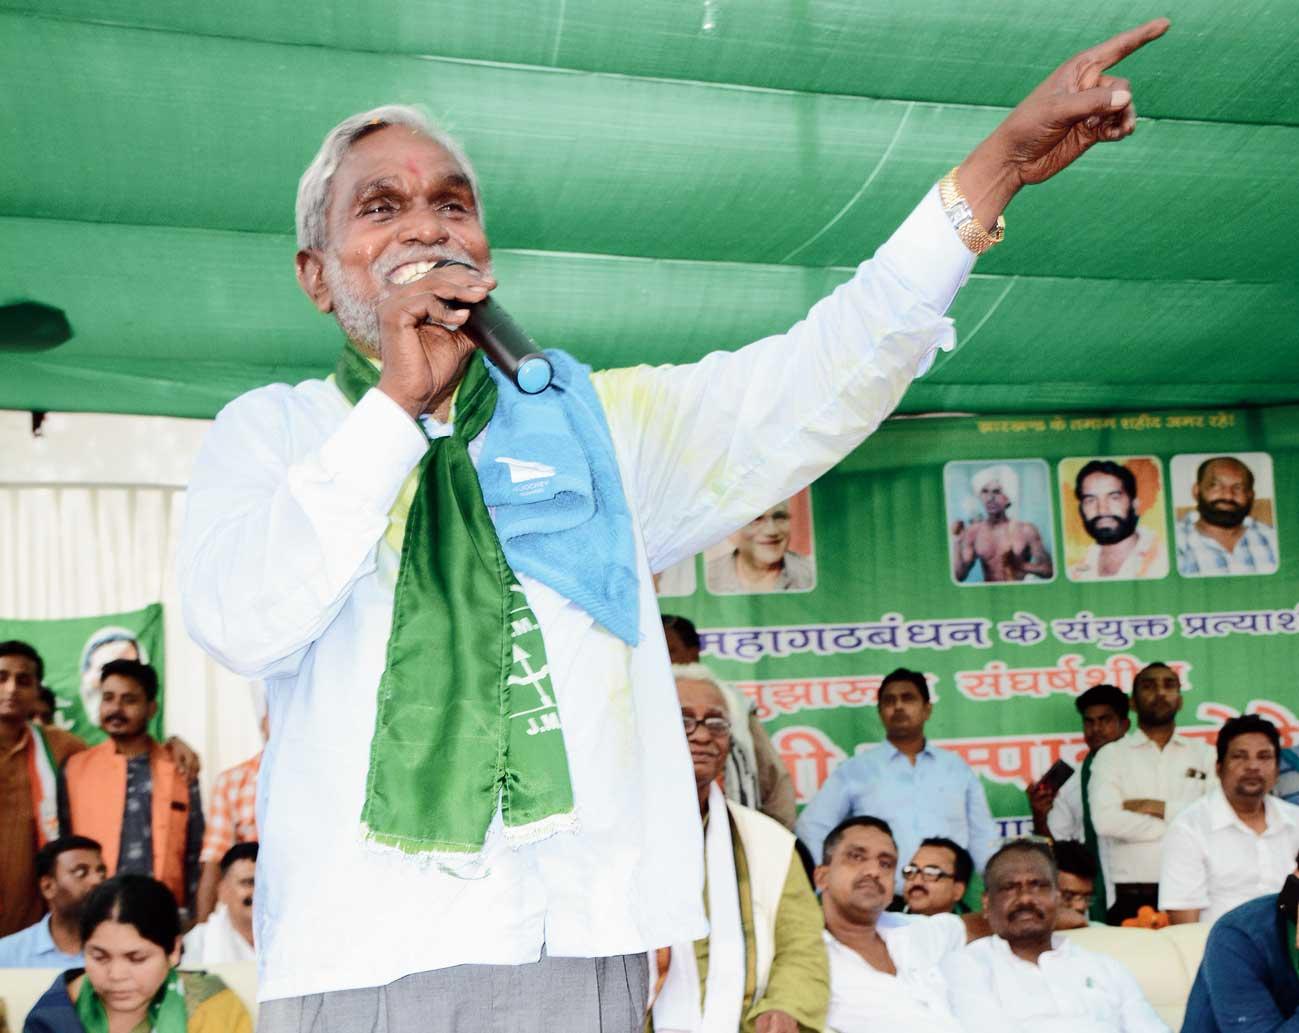 JMM's Champai Soren at an election rally.